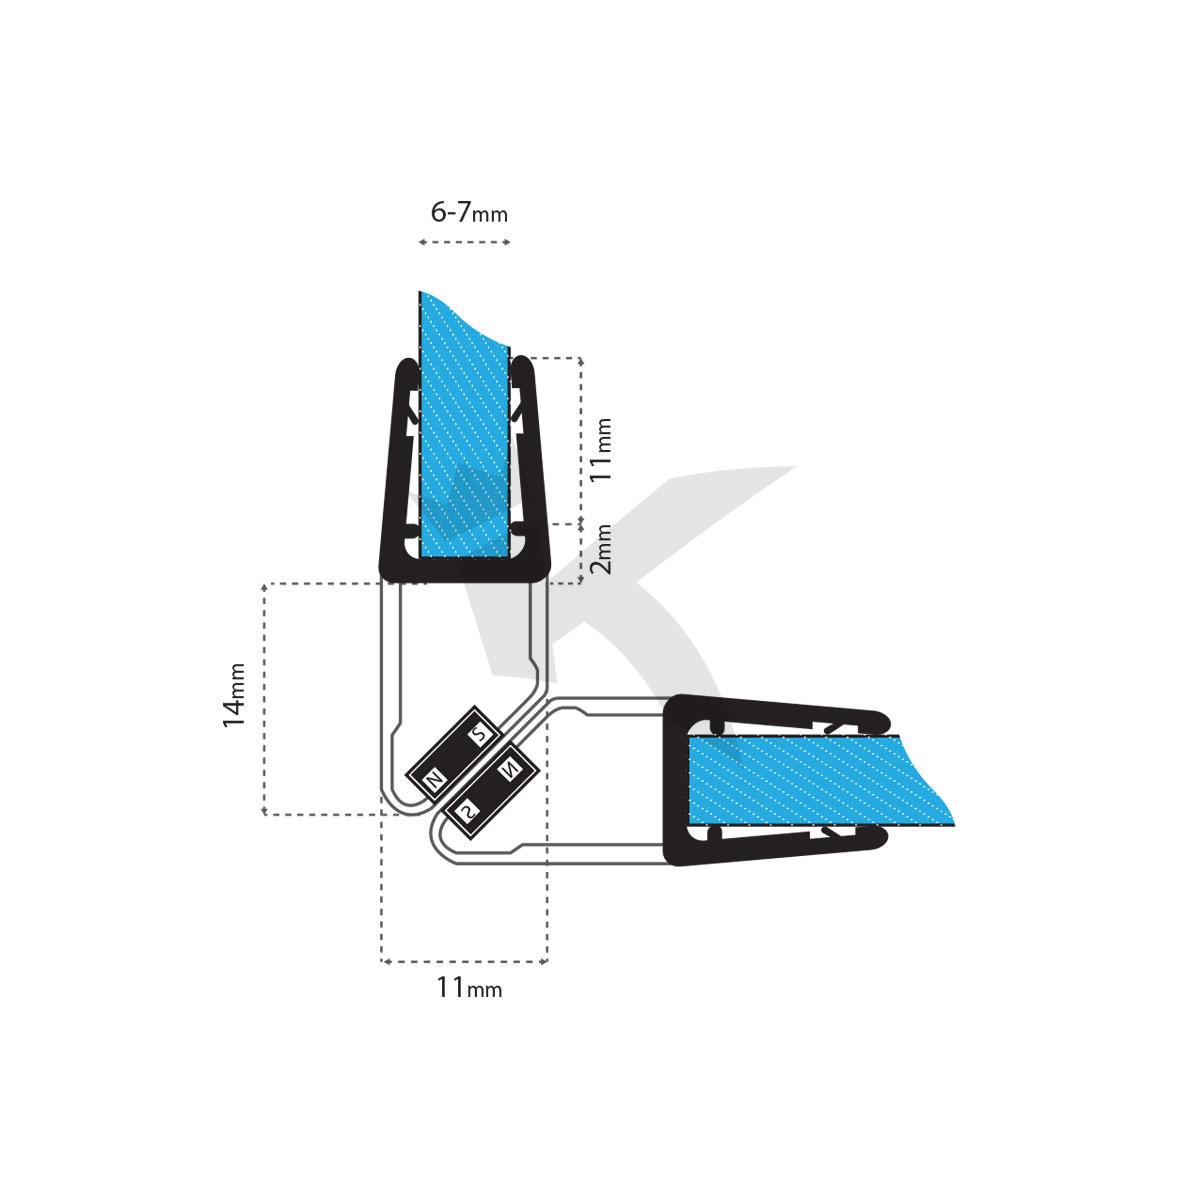 duschdichtung magnet wasserabweiser ersatzdichtung duschprofil duscht r dichtung ebay. Black Bedroom Furniture Sets. Home Design Ideas